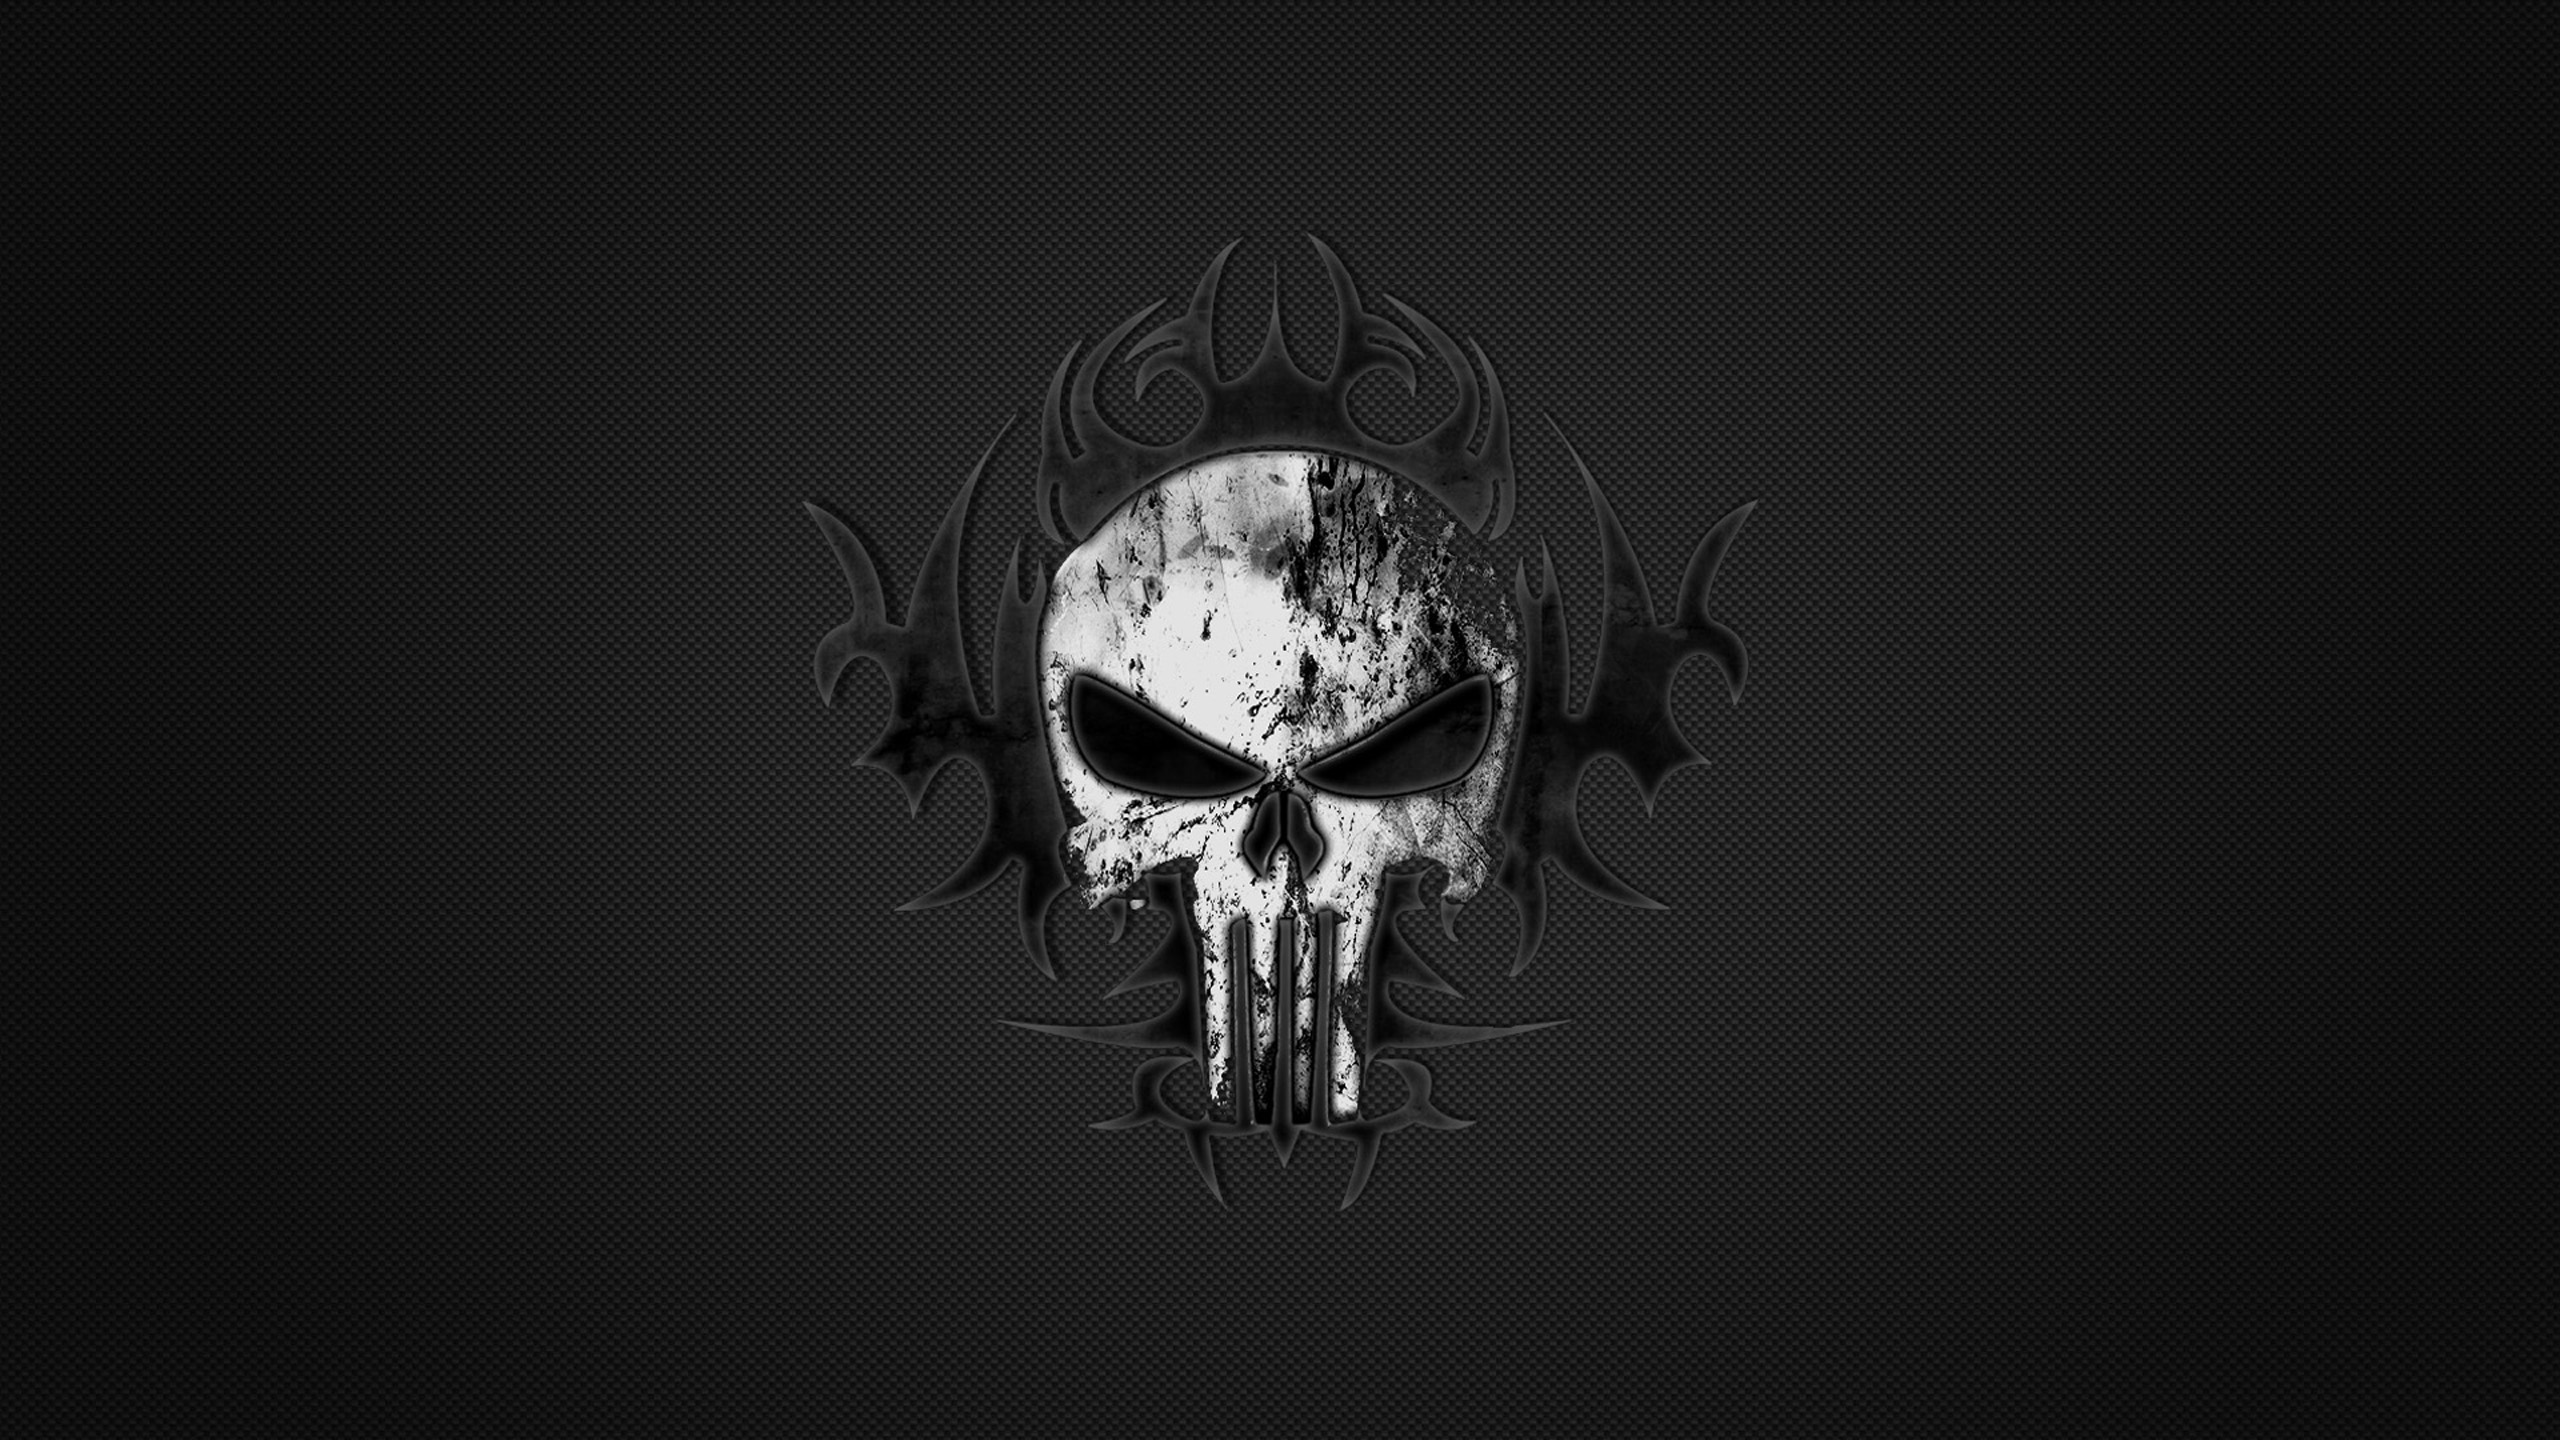 Punisher Skull wallpaper HD Desktop Wallpapers 2560x1440